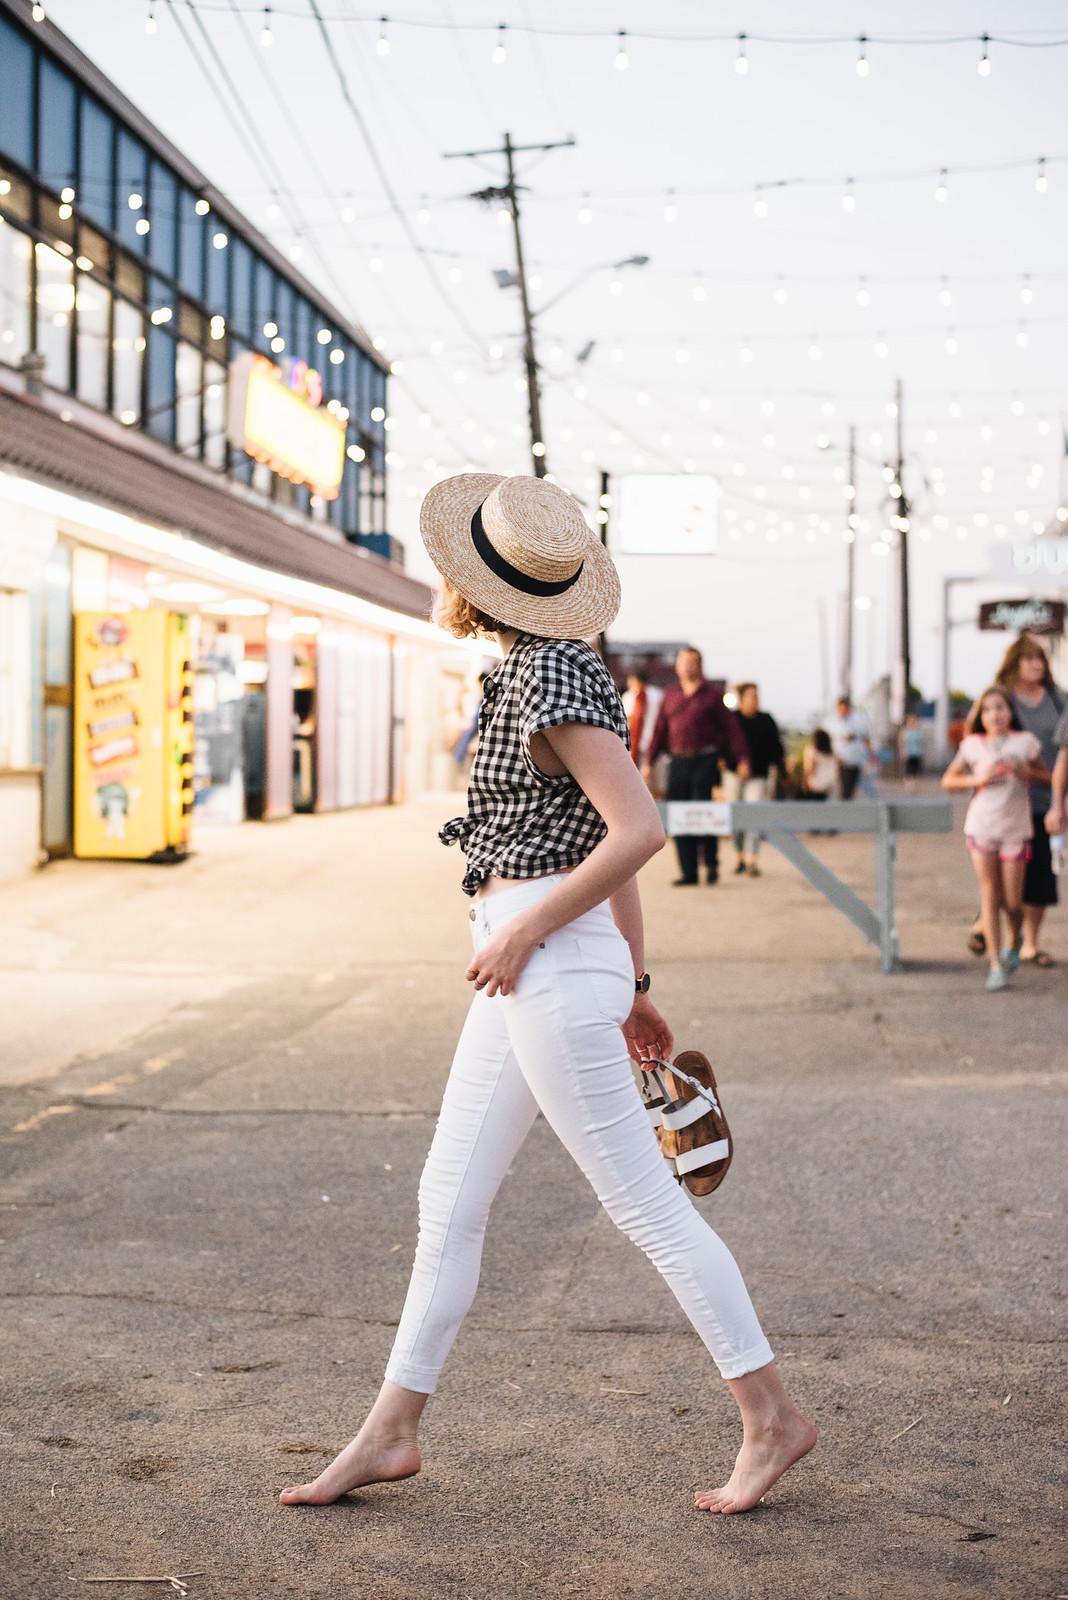 Gingham Shirt, White Jeans, and Straw Boater Hat on juliettelaura.blogspot.com